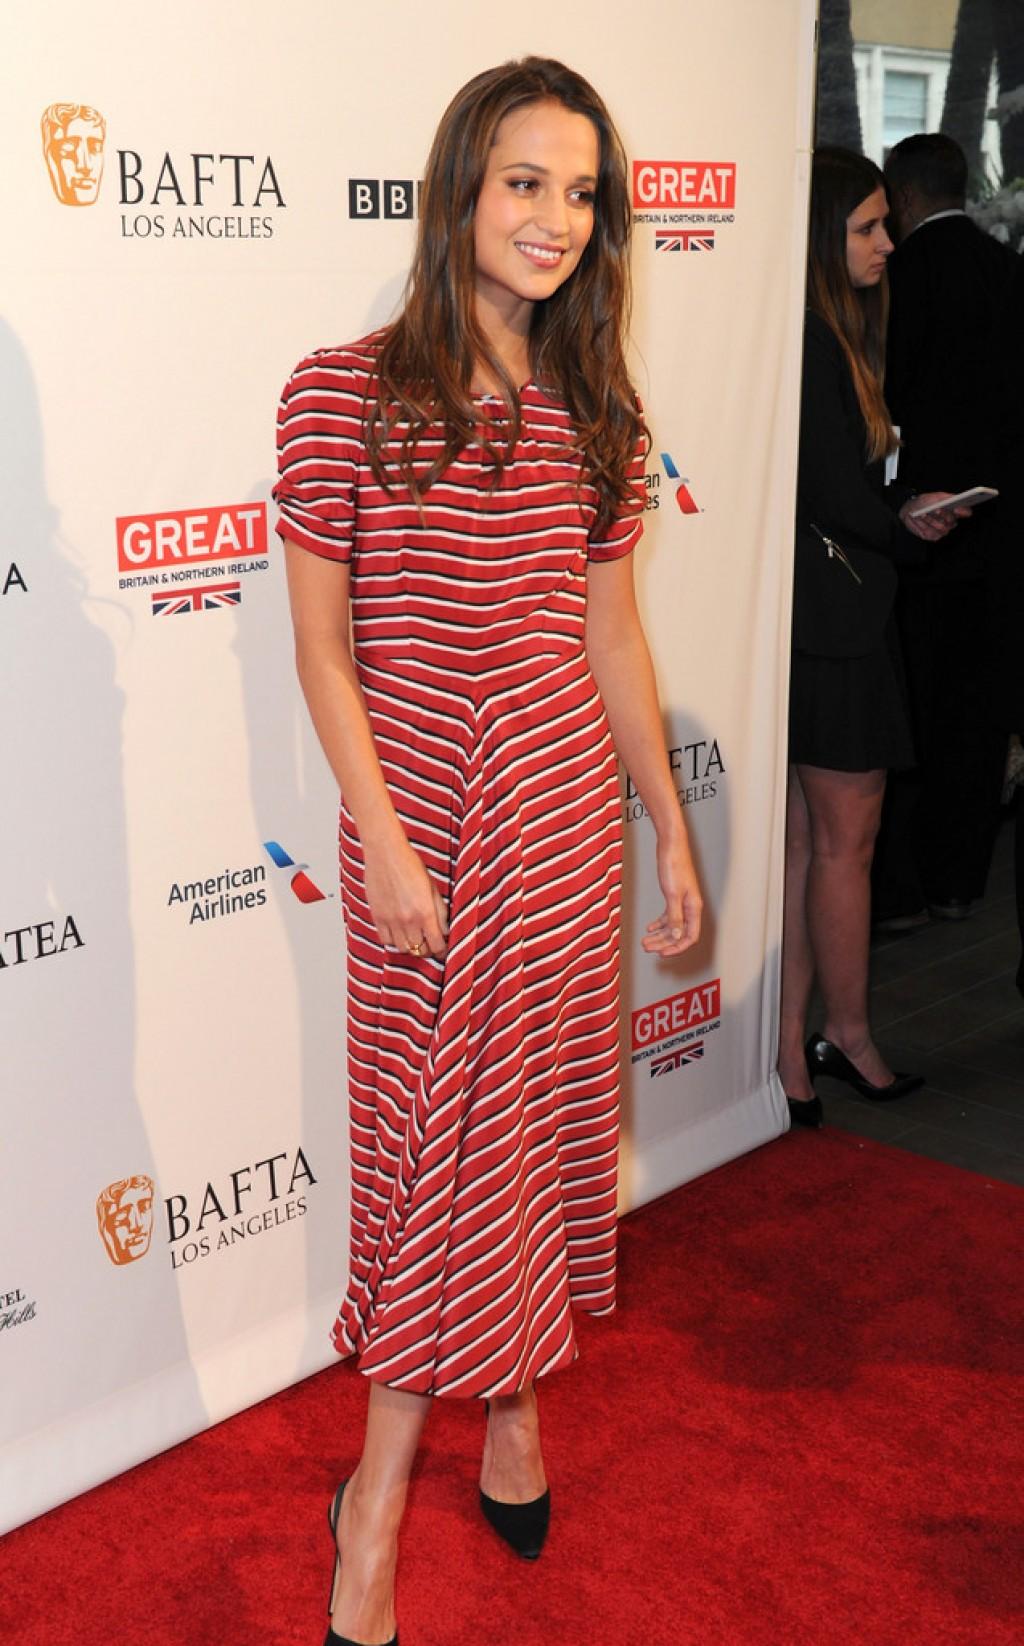 BAFTA-Los-Angeles-Awards-Season-Tea-Dress-Gown-1024x1646